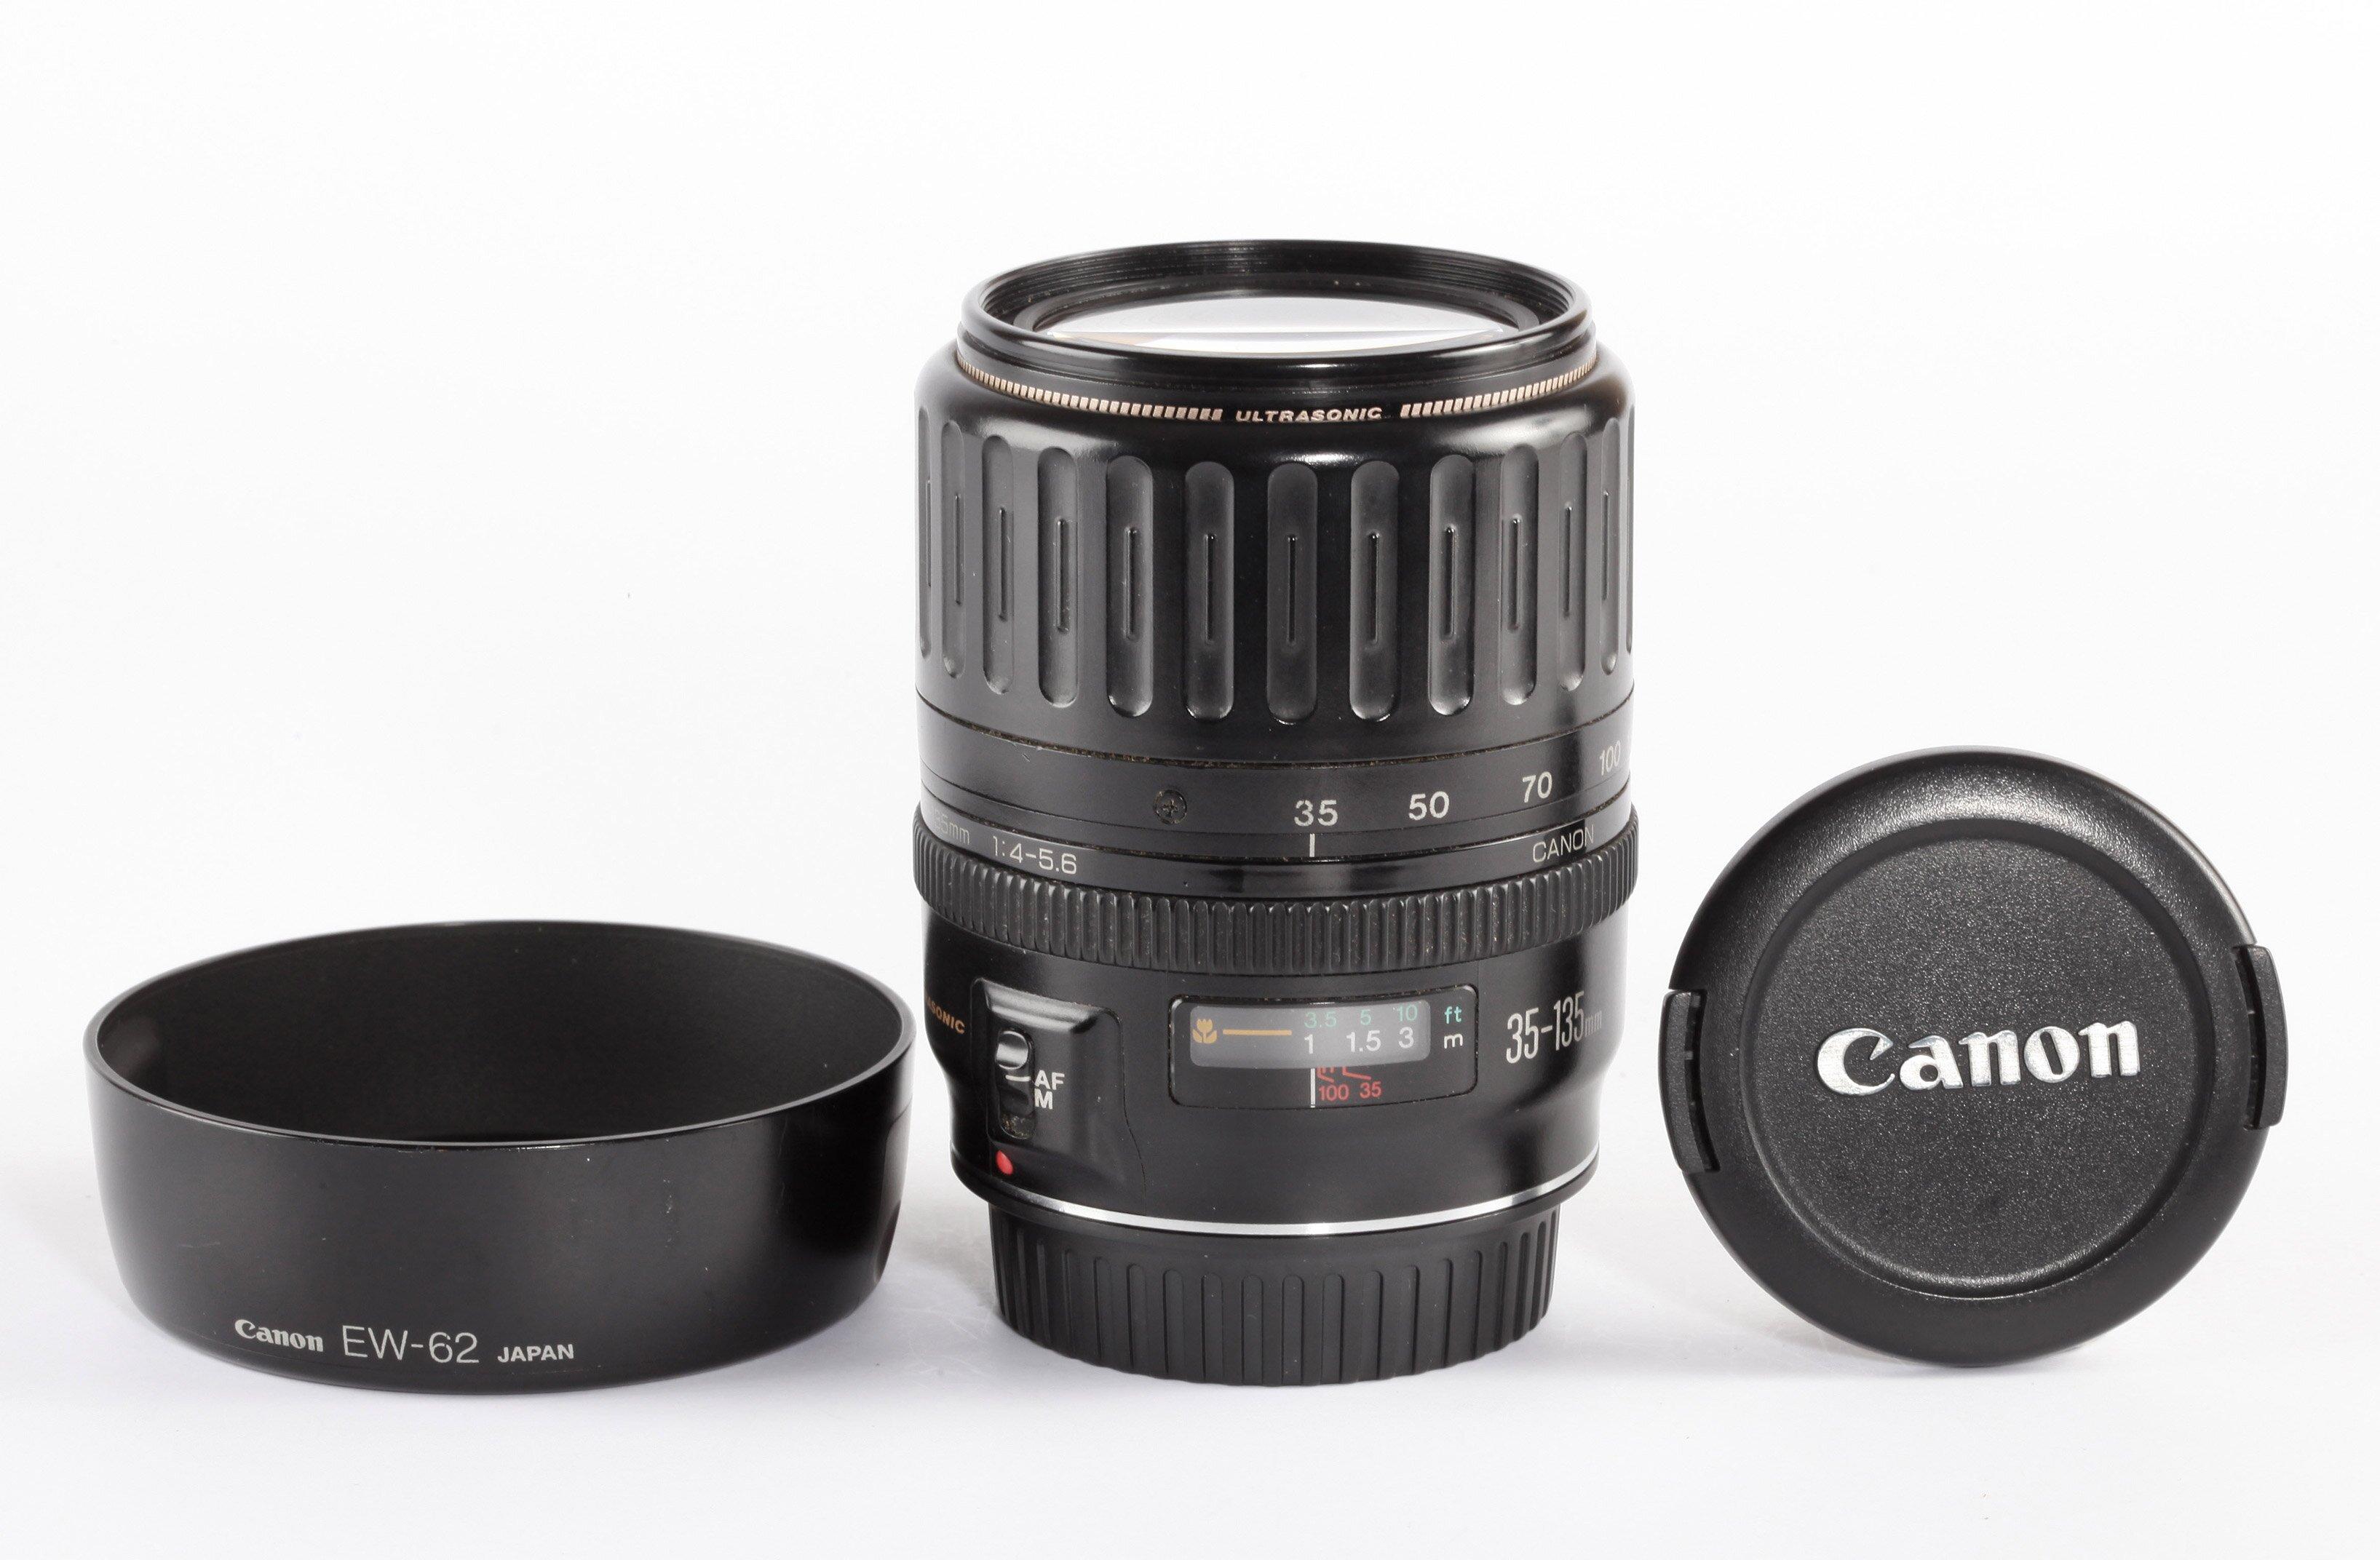 Canon 35-135mm 4-6,5 Ultrasonic